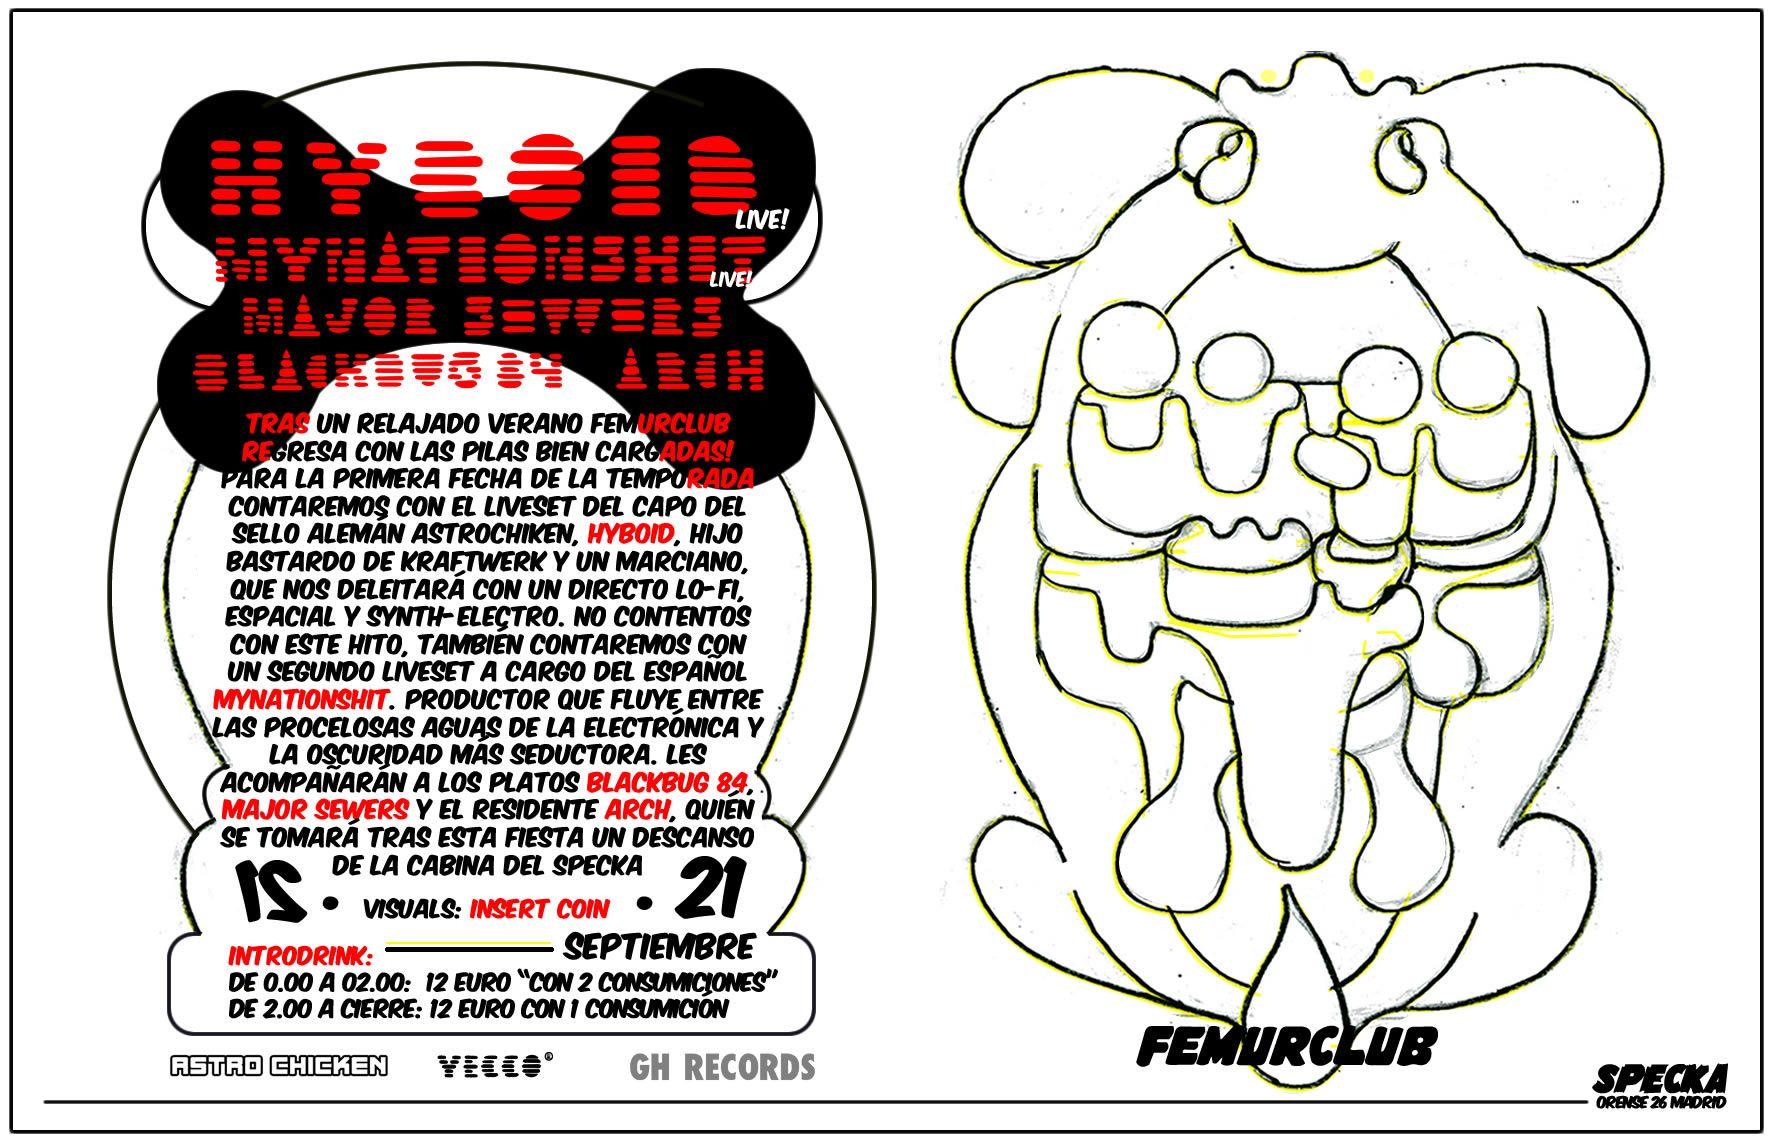 FEMURCLUB 21.09.2012 HYBOID LIVE & MYNATIONSHIT LIVE Hyboidcombofinal2